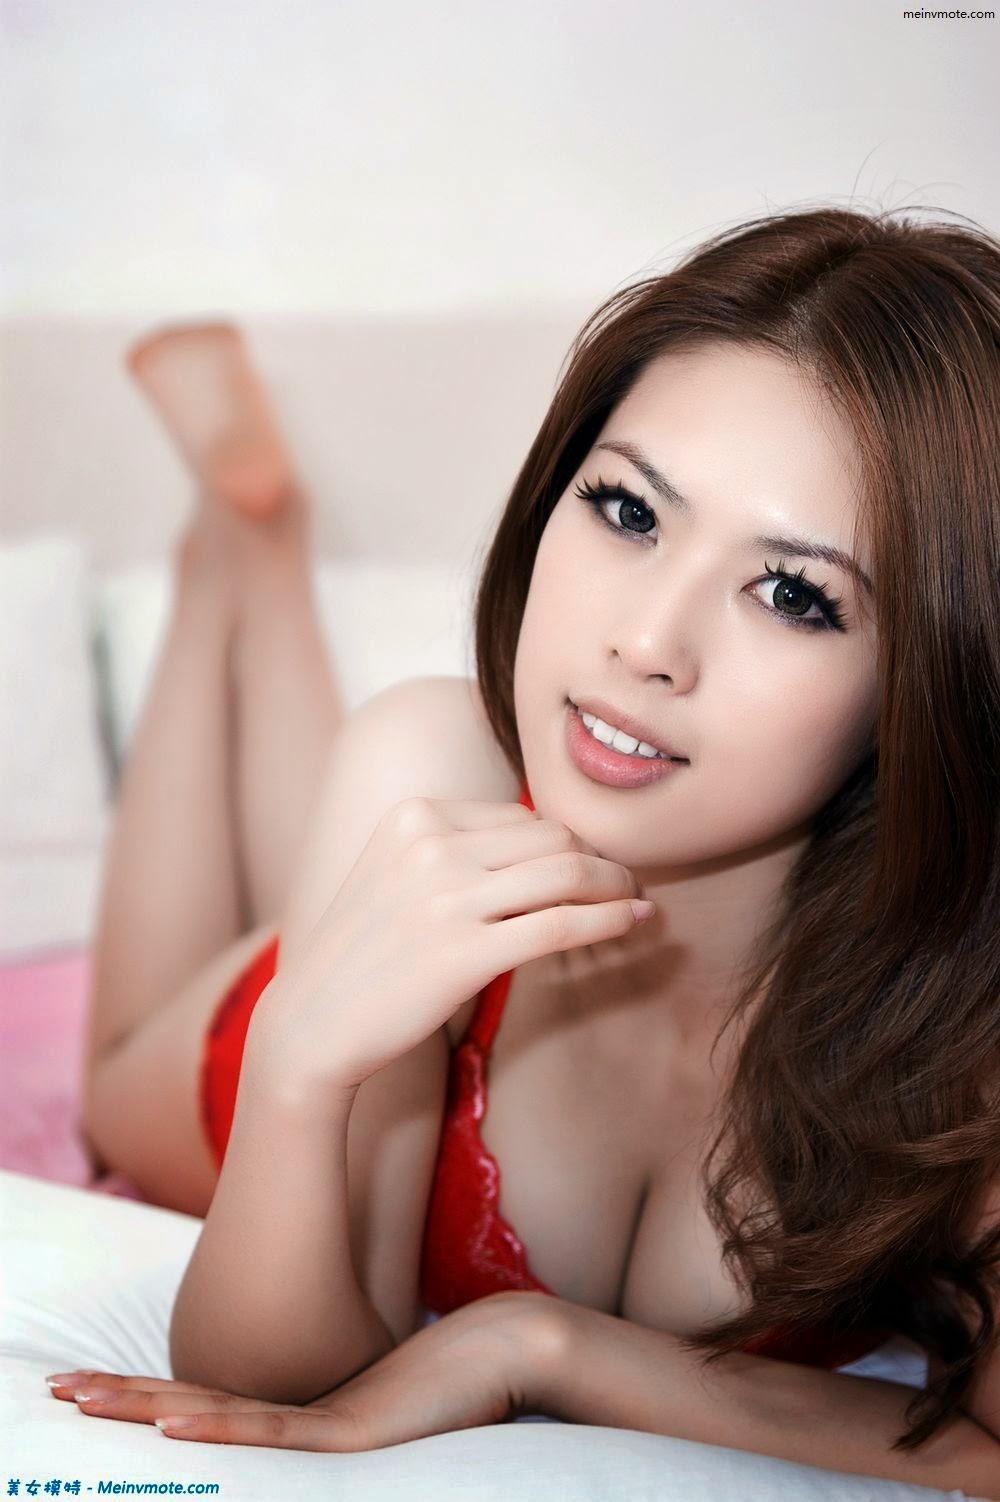 Graceful figure red underwear model interpretation